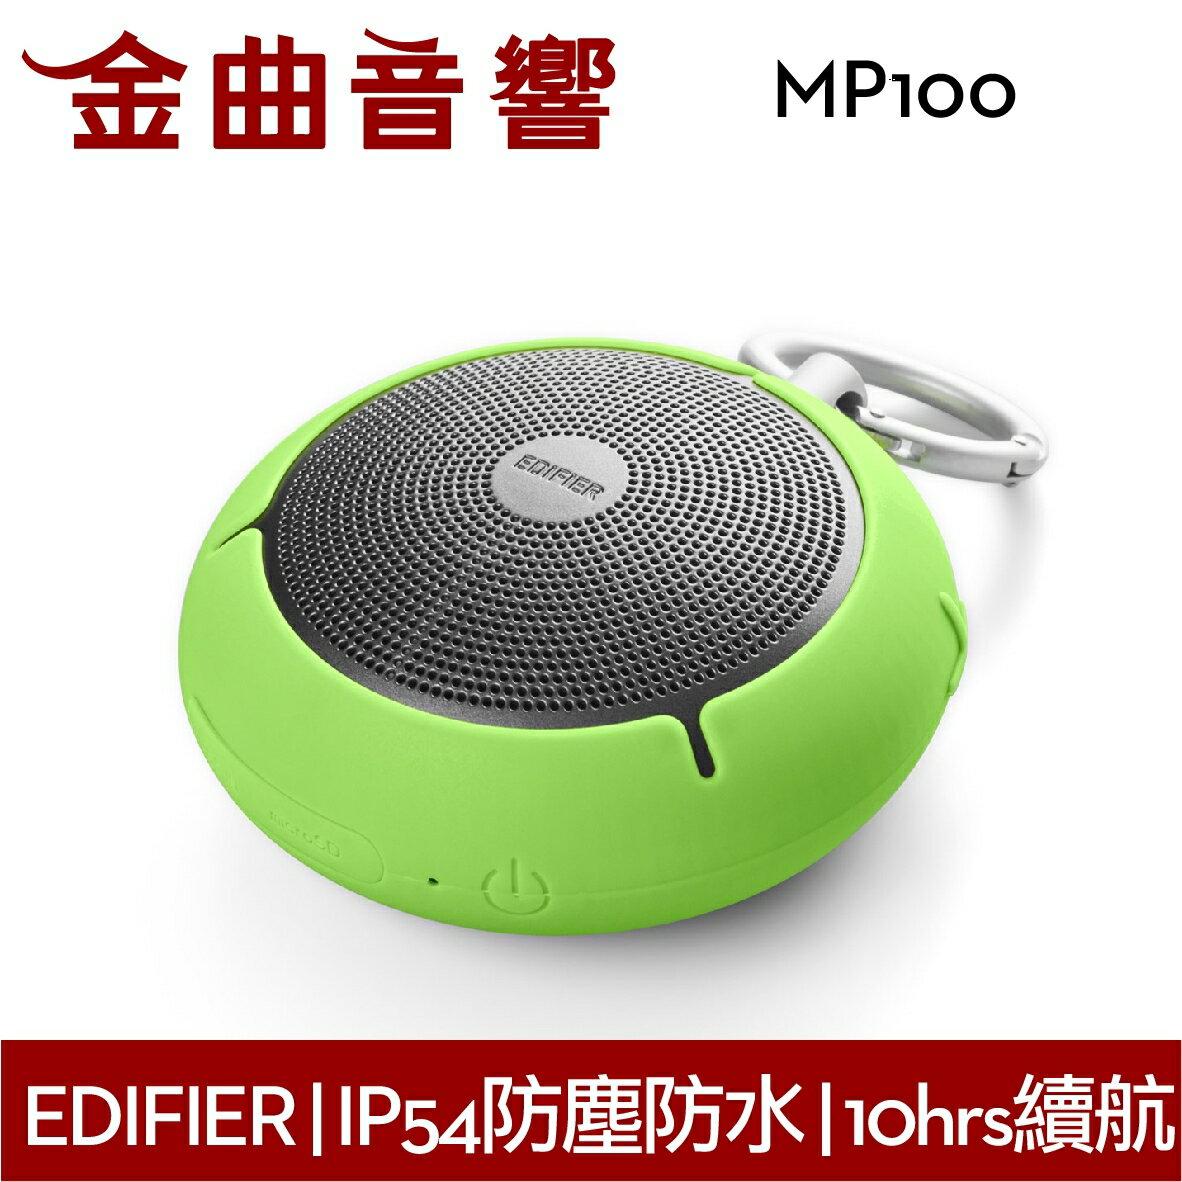 EDIFIER 漫步者 MP100 綠色 迷你型隨身藍牙喇叭 | 金曲音響